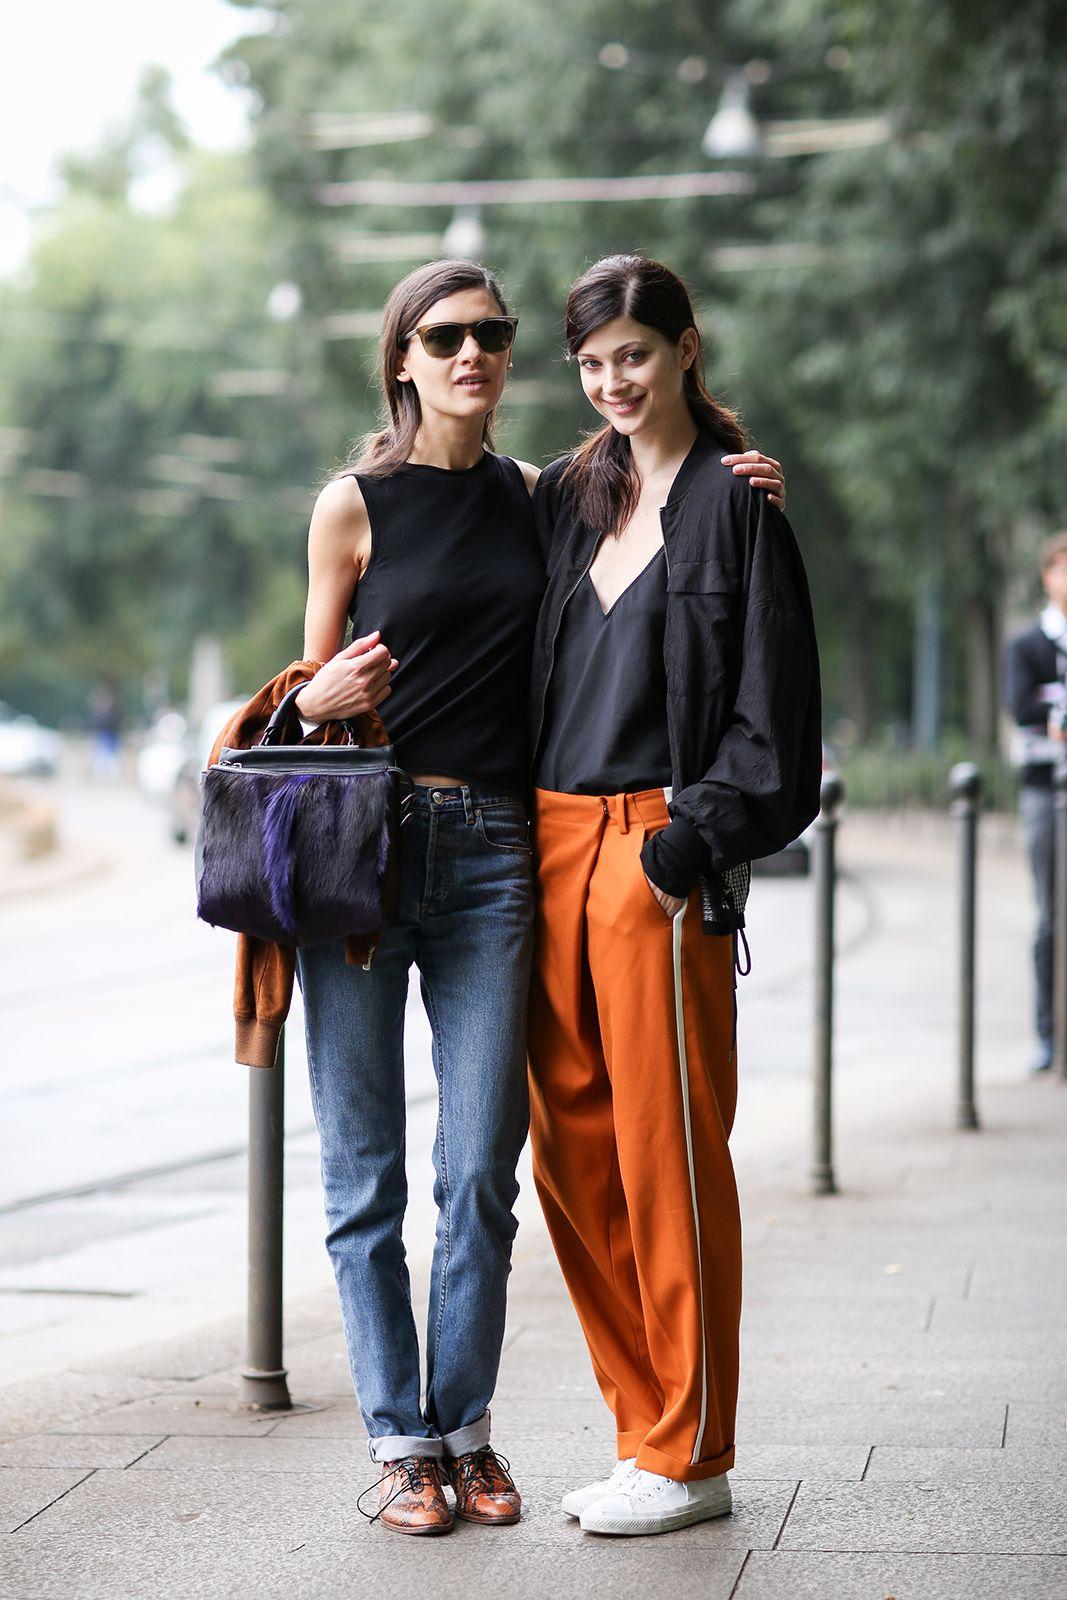 Parisian VS Milanese: A Fashion Show-Down. - B2B Media Ltd 23